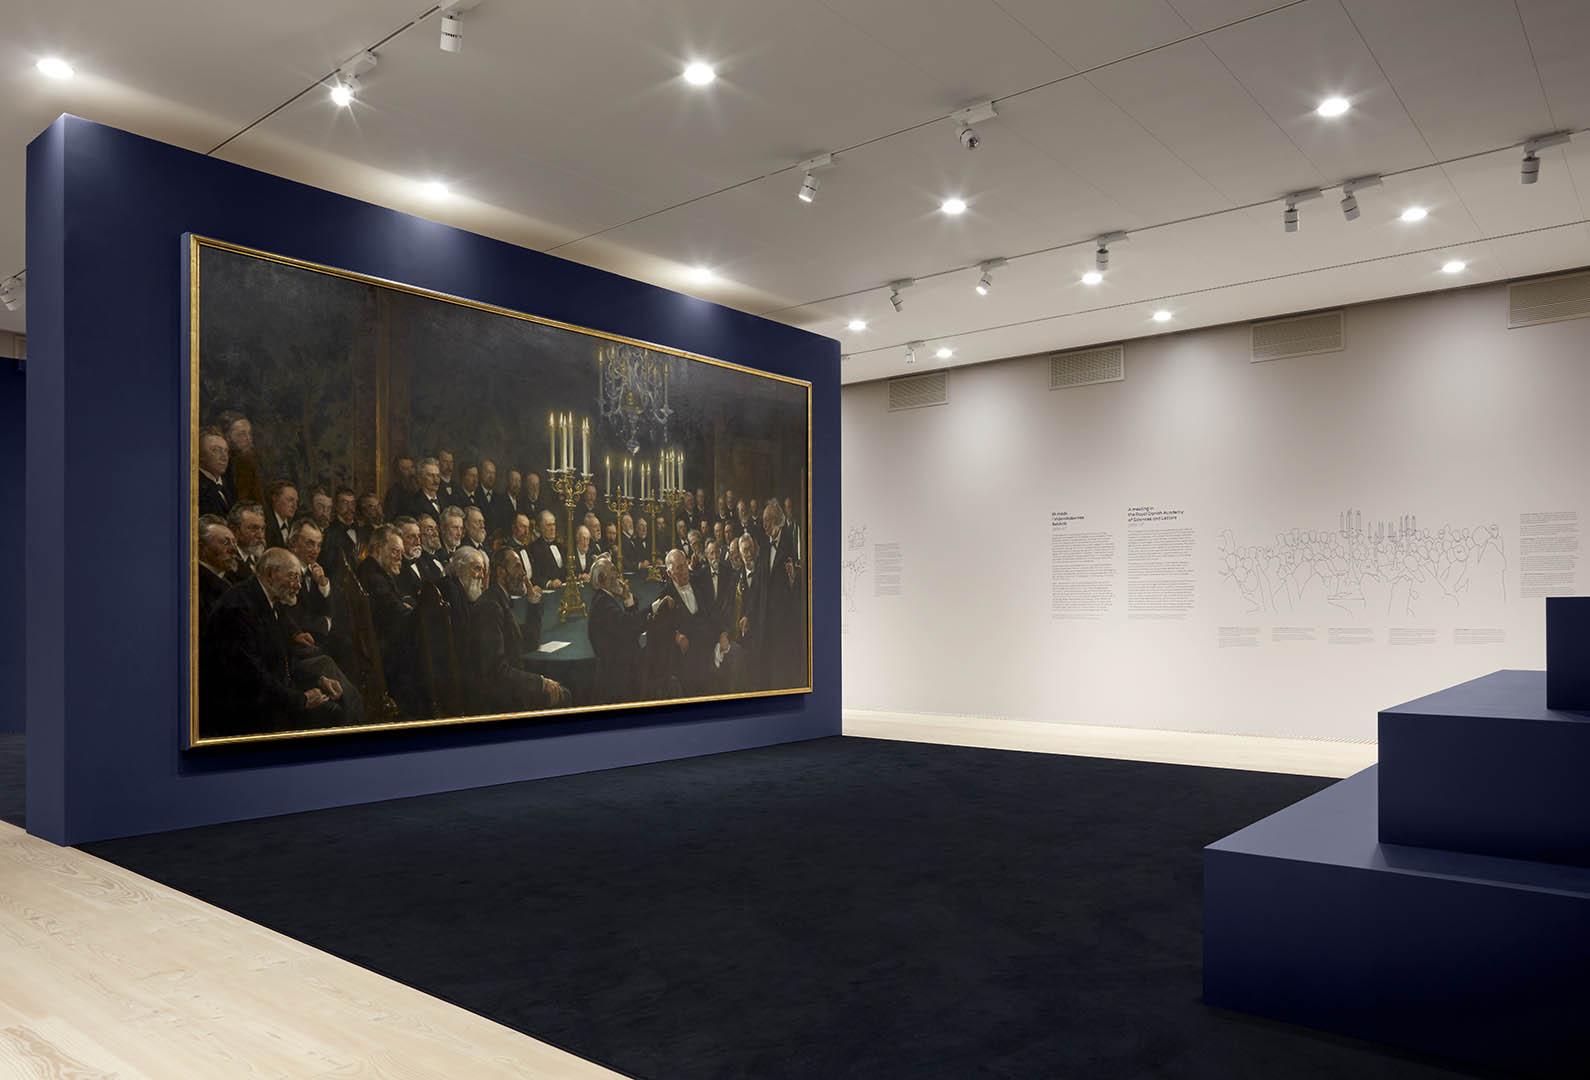 Udstillingen 'MESTERVÆRKER – Krøyer på bestilling' på Skagens Museum. Installation view